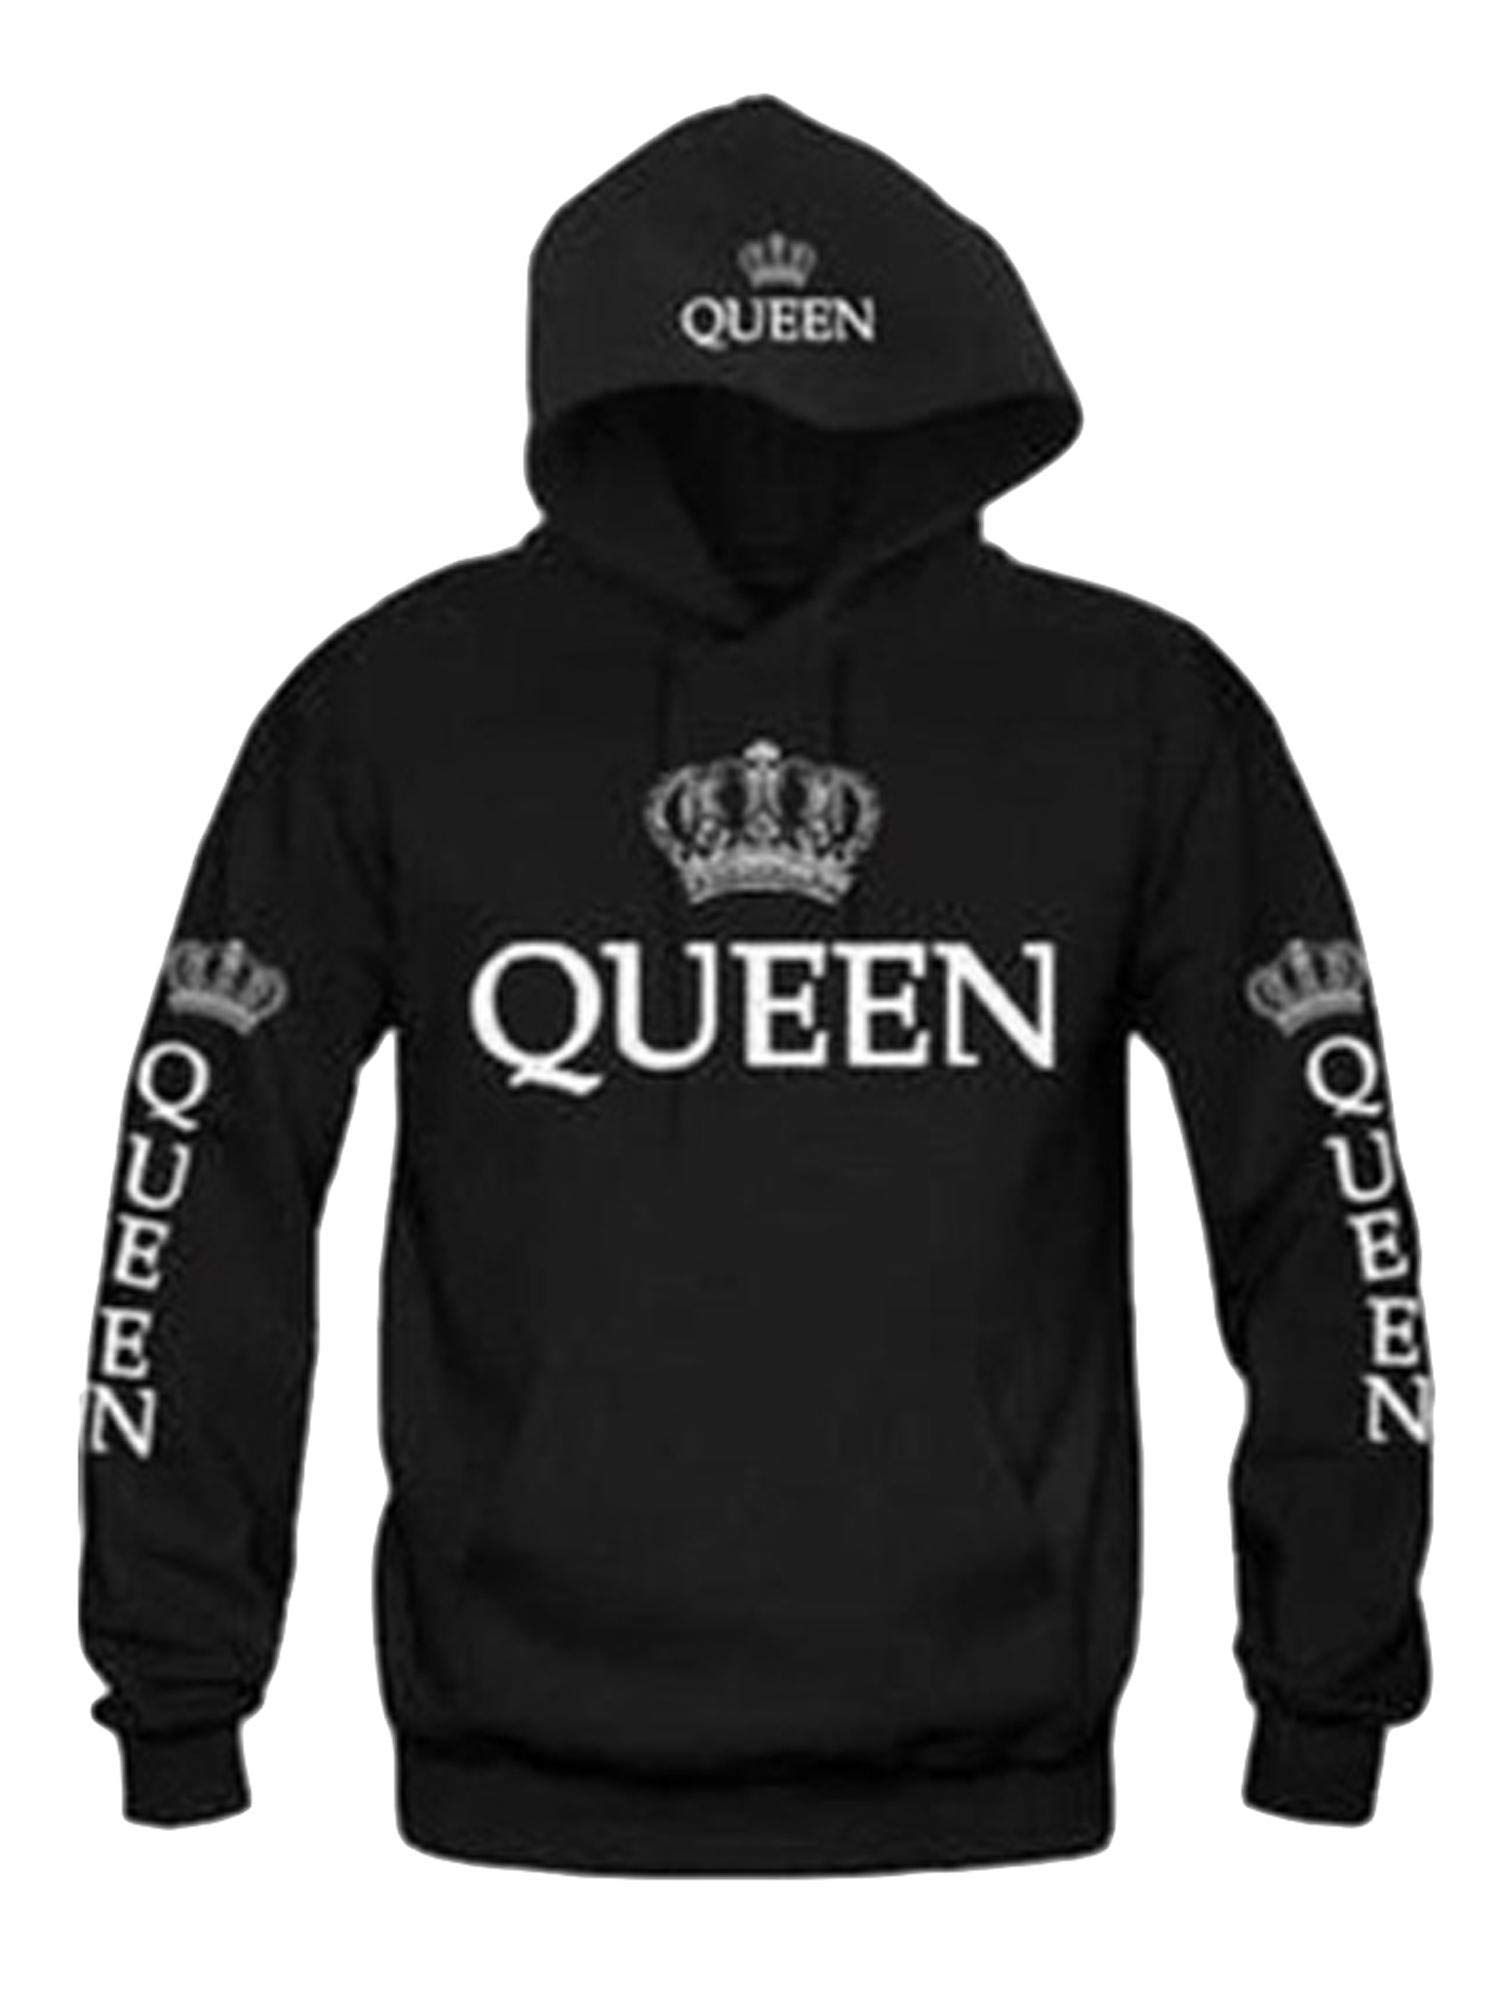 lazinem Neudas Unisex Casual Hooded Neck Long Sleeve Letter Print Front Pocket Hoodie Sweater Fashion Hoodies Black